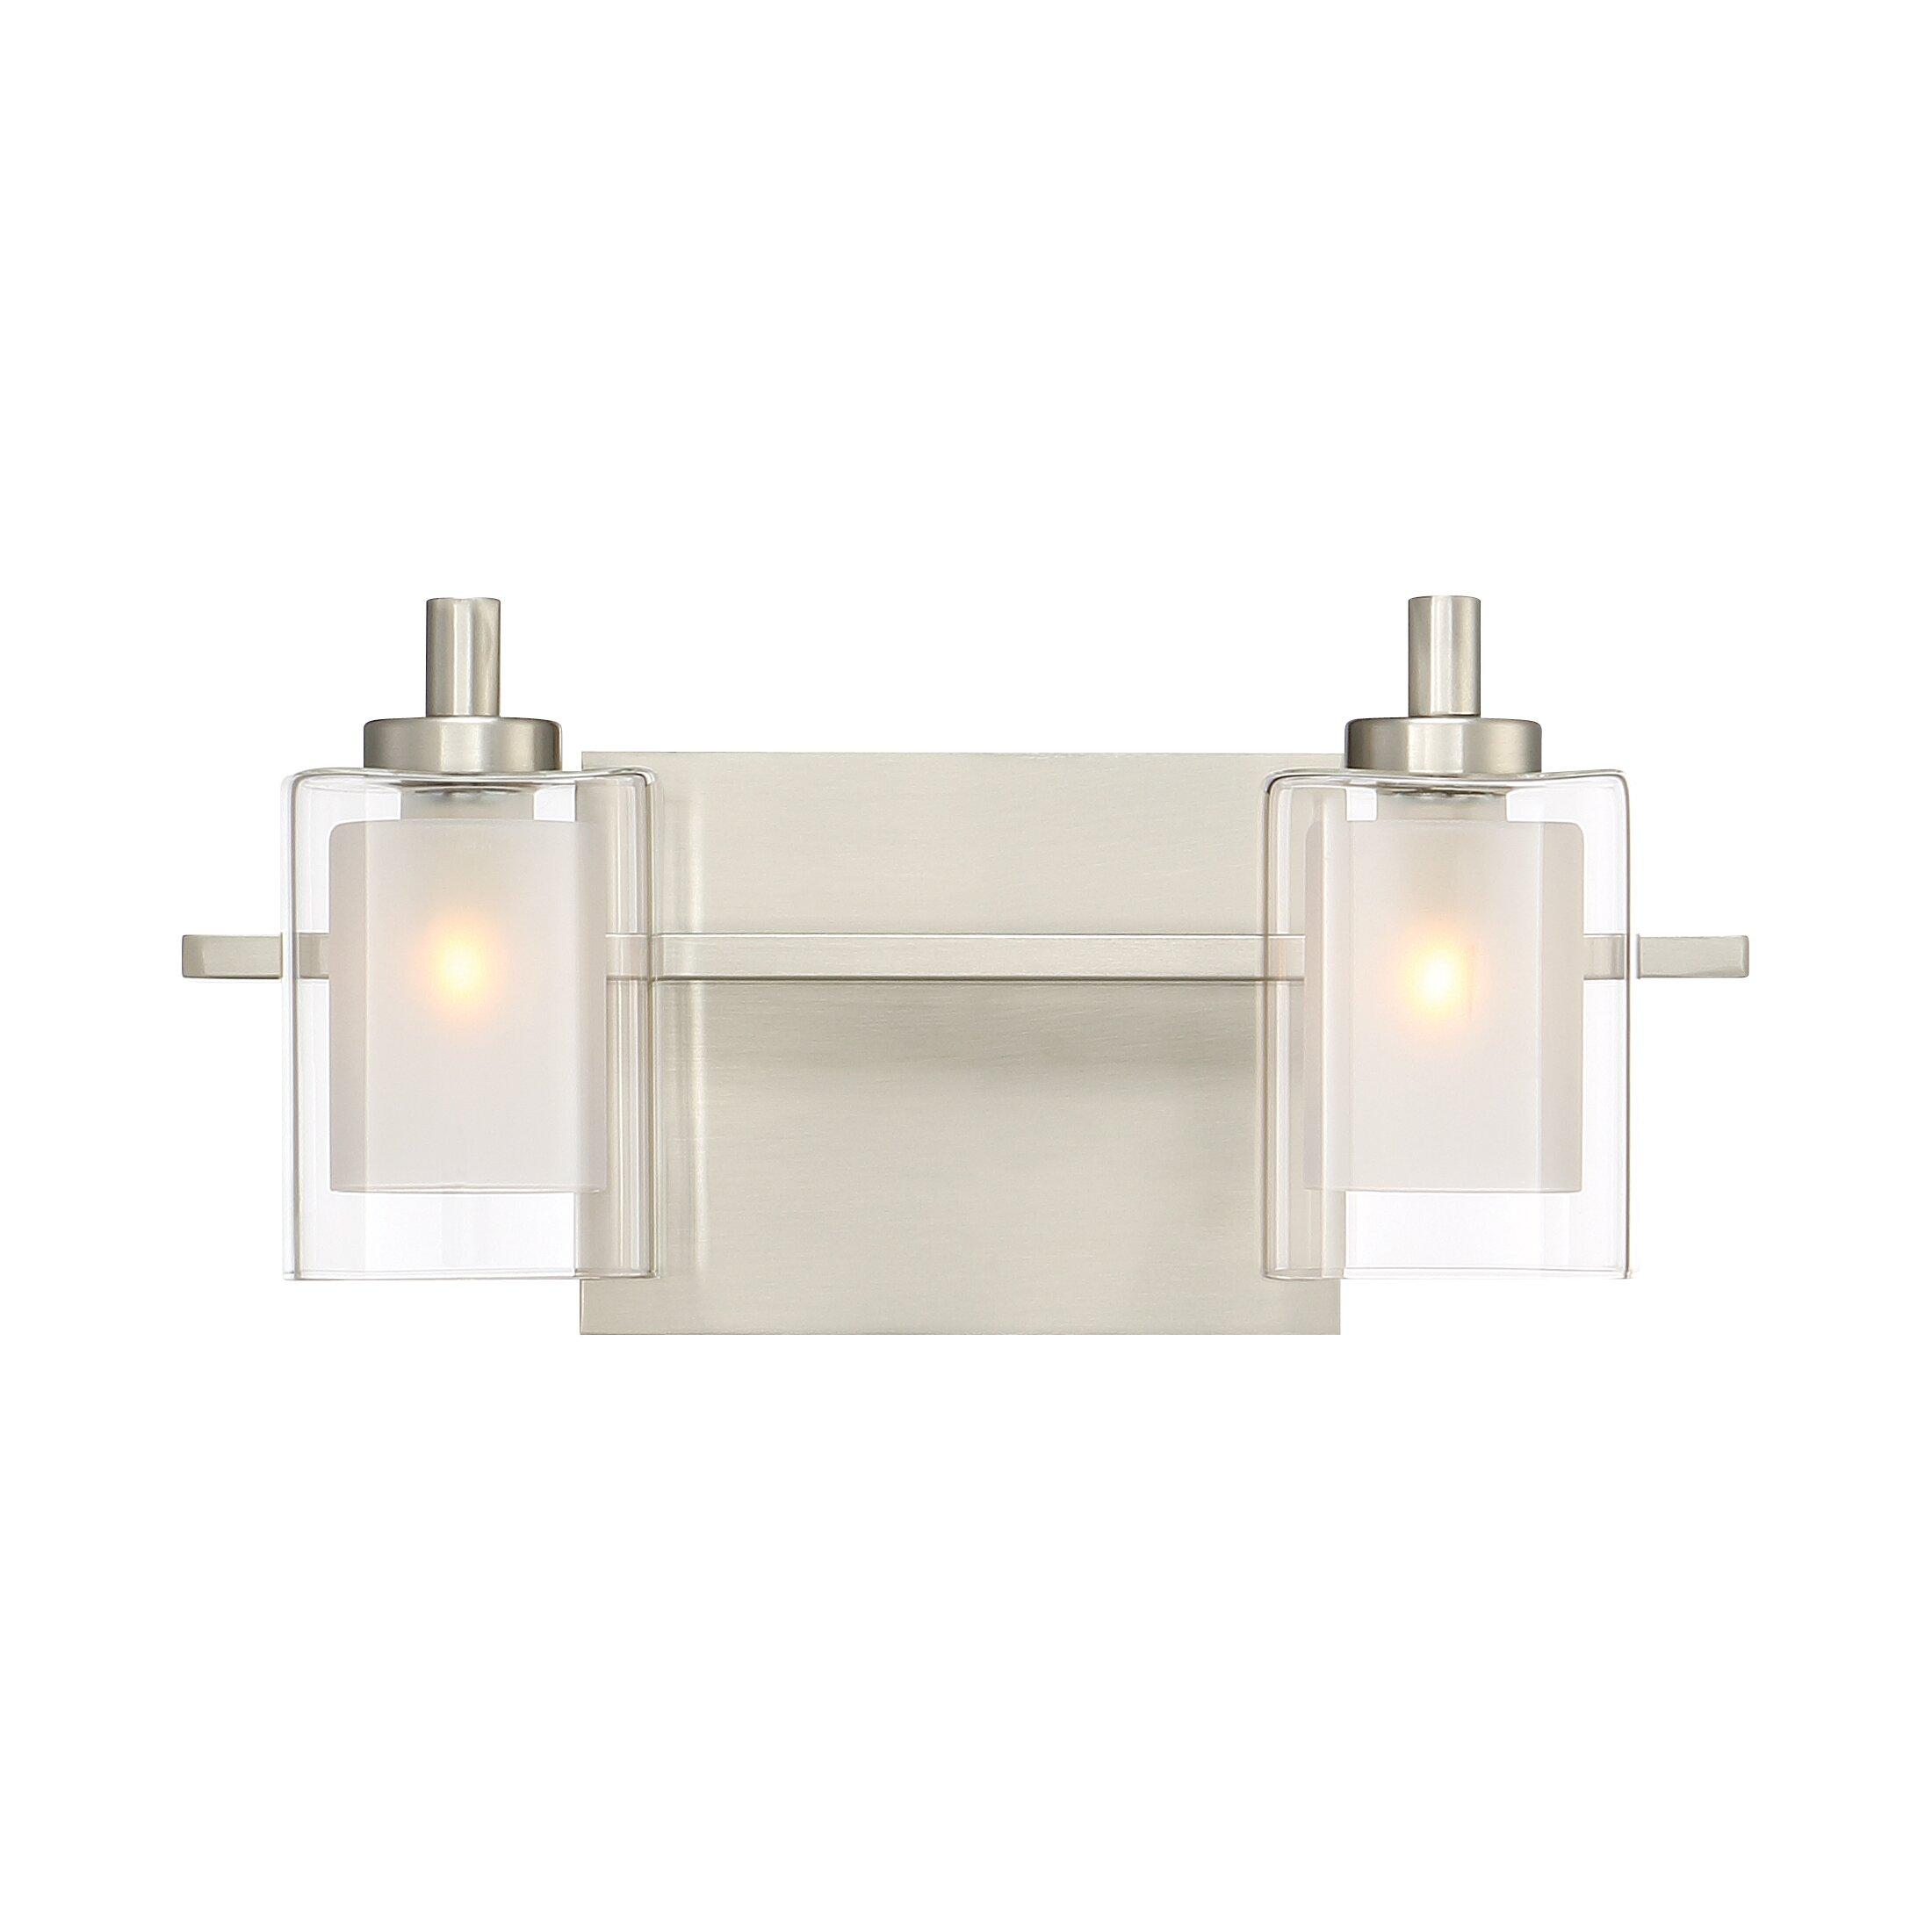 6 light bathroom vanity lighting fixture | My Web Value